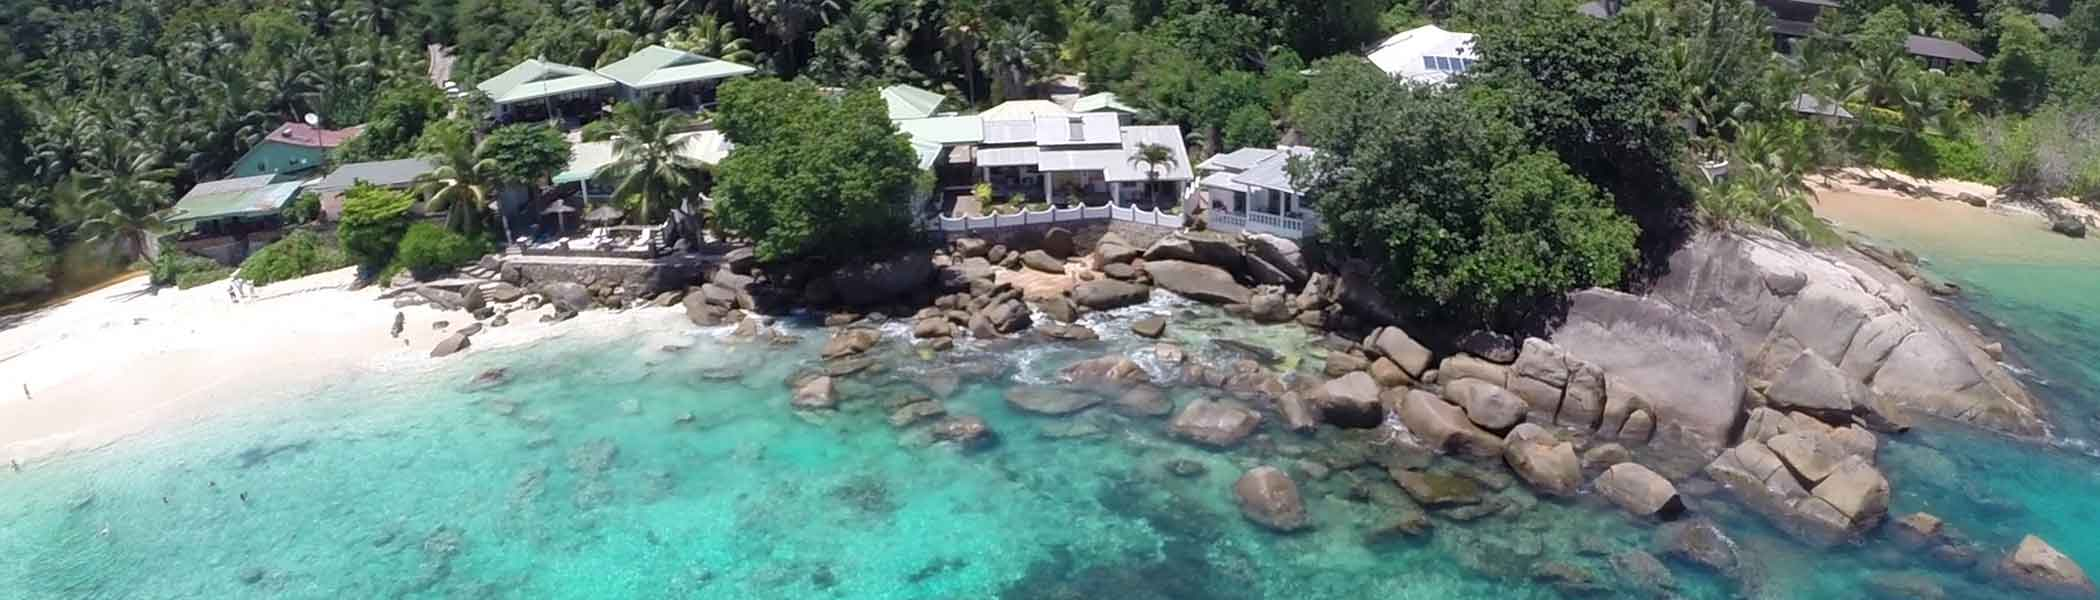 anse-soleil-beachcomber, Hotels in Seychelles Islands